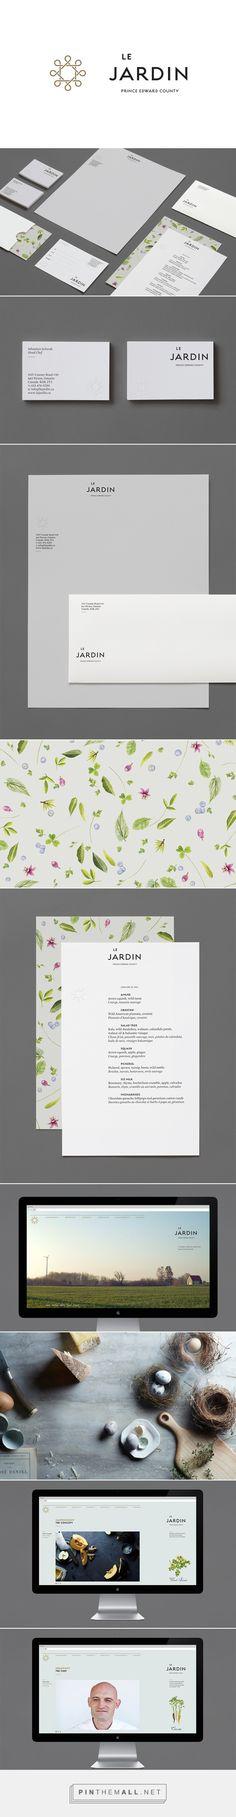 Le Jardin on Branding Served. Corporate Identity, Corporate Design, Visual Identity, Brand Identity, Logo Branding, Branding Design, Logo Design, Graphic Design, Logos